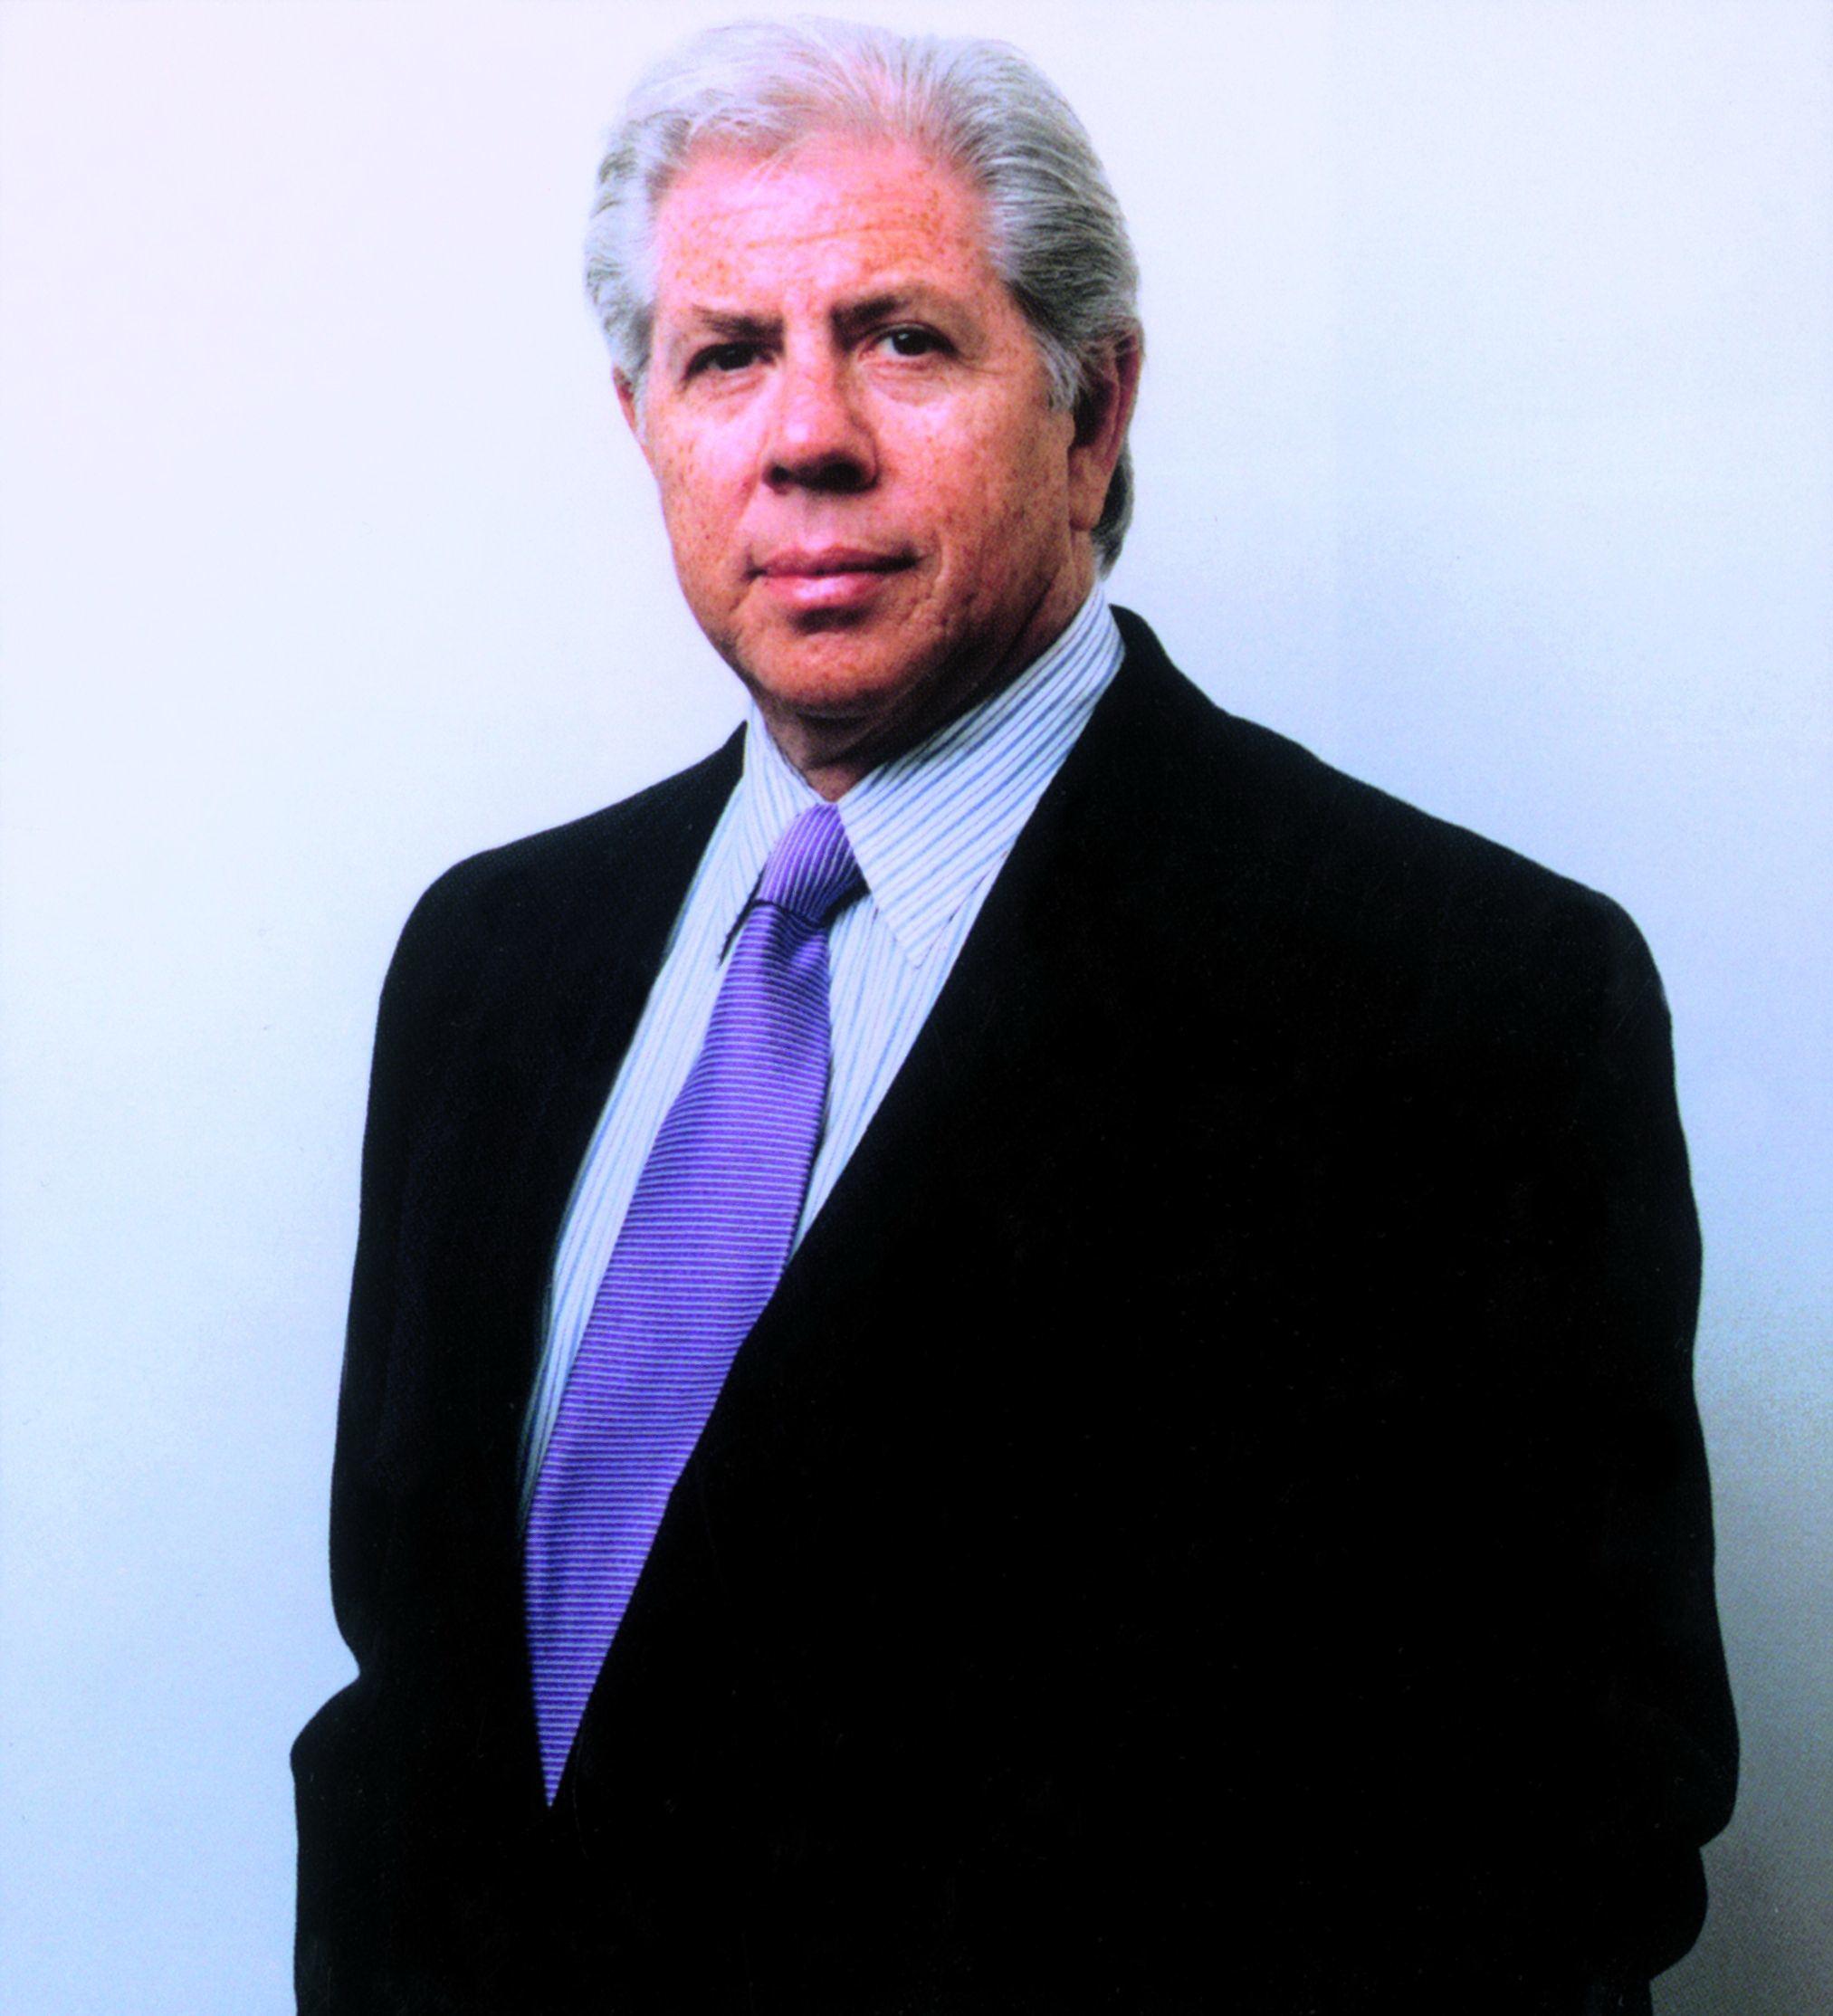 Carl Bernstein, a A Watergate-botrány egyik kirobbantója